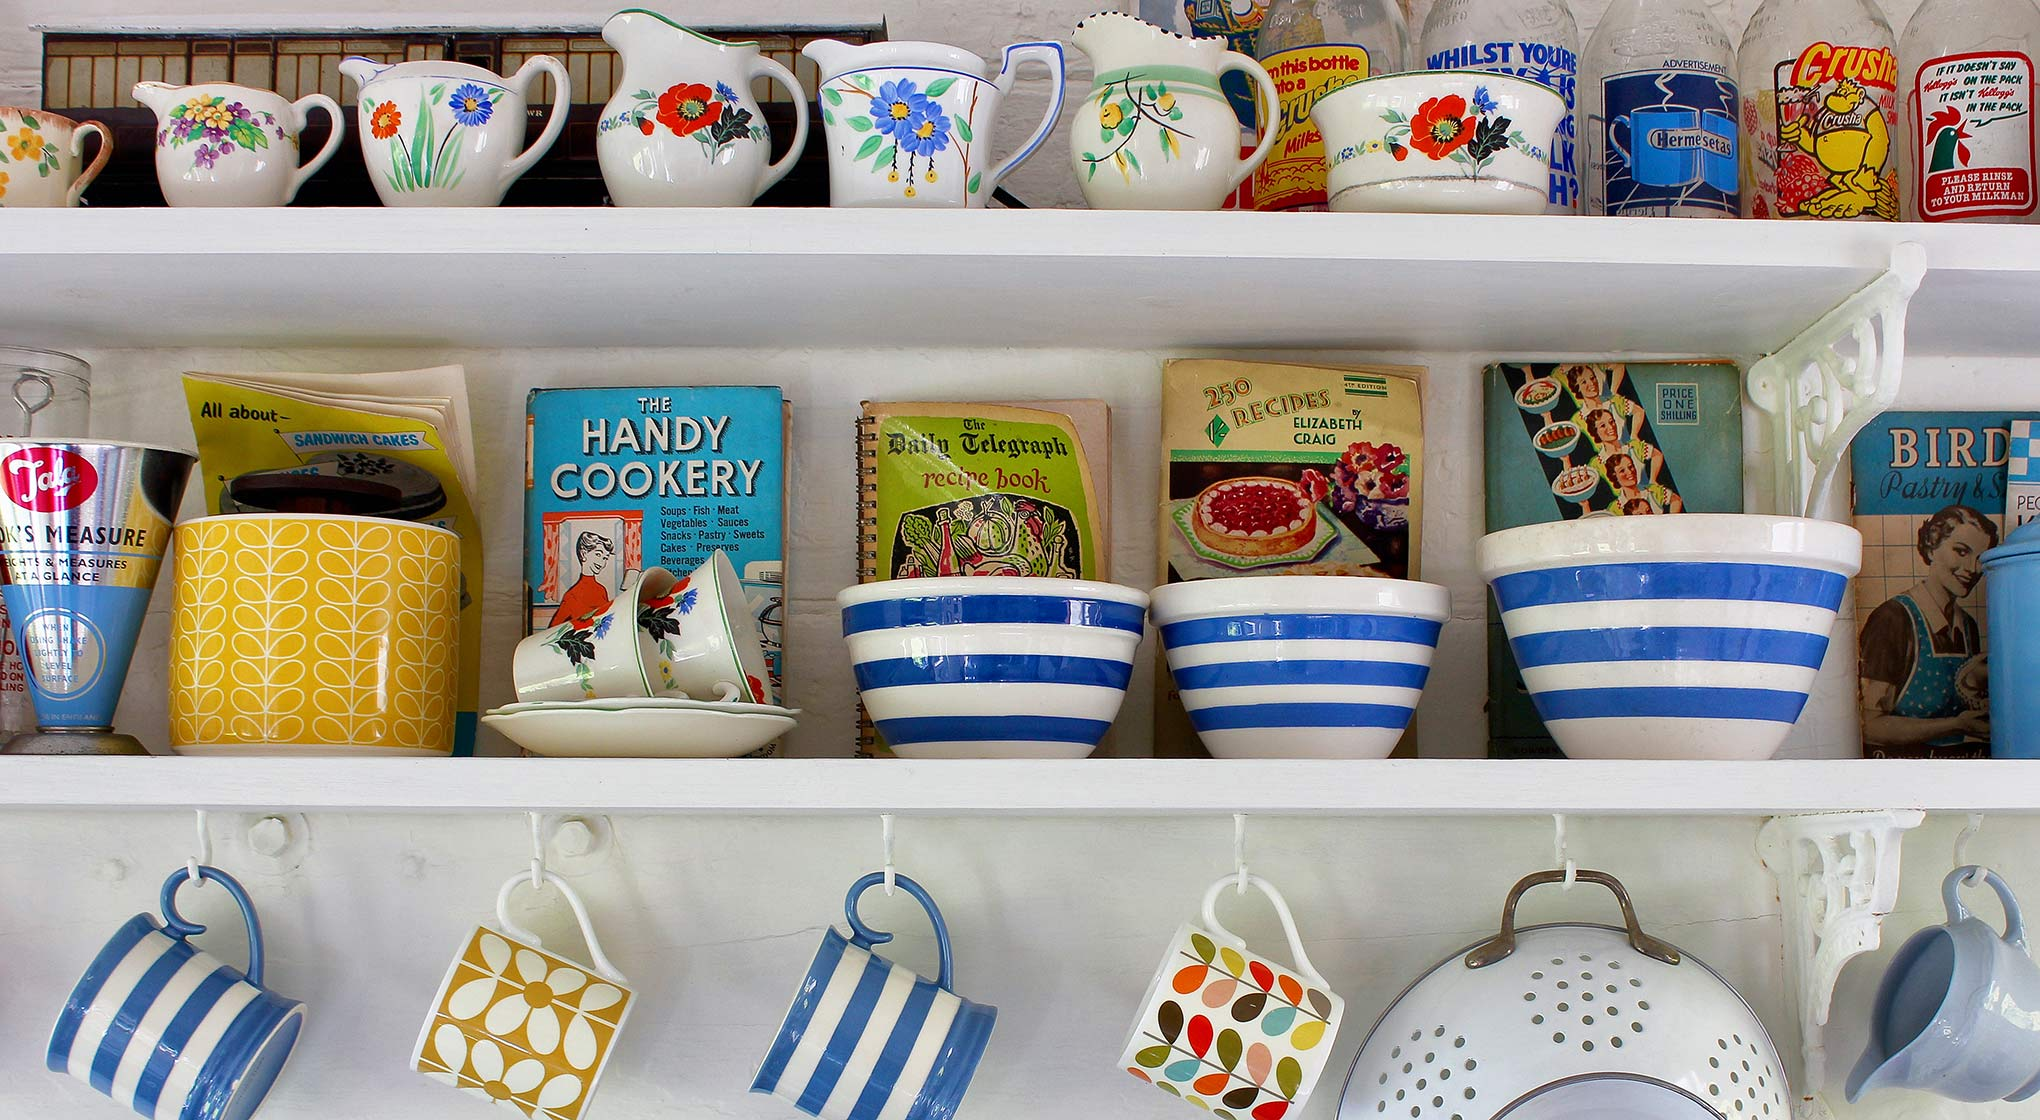 Interior-kitchen shelves.jpg